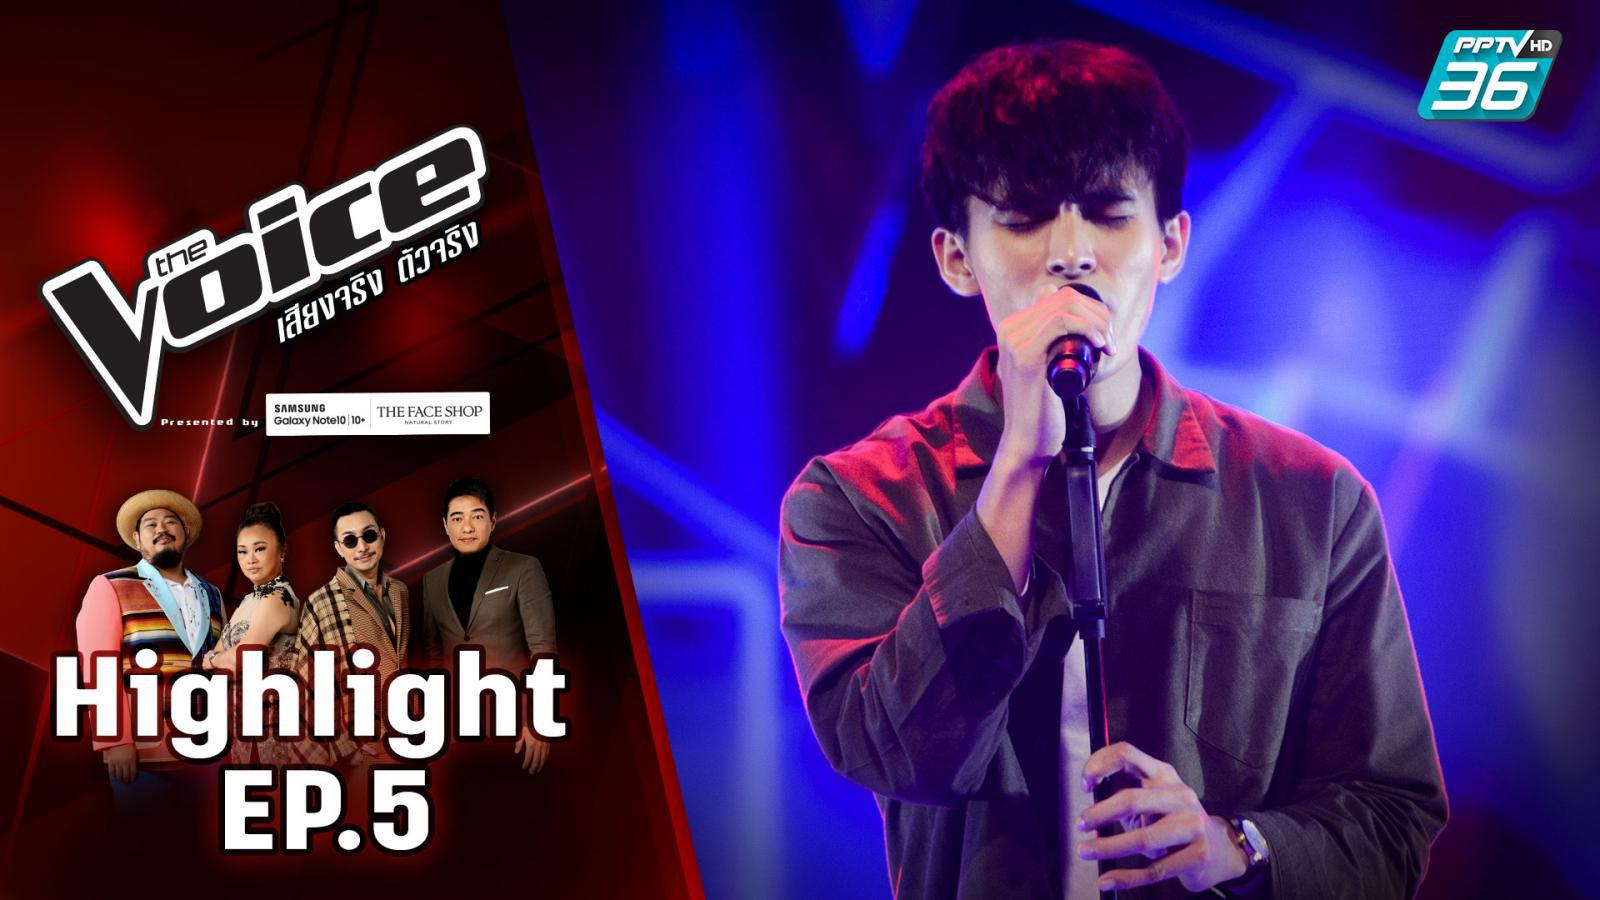 The Voice 2019   เจมส์ ครูสอนร้องเพลงวัย 23 ที่มีเสียงร้องชวนหลง    Highlight EP5